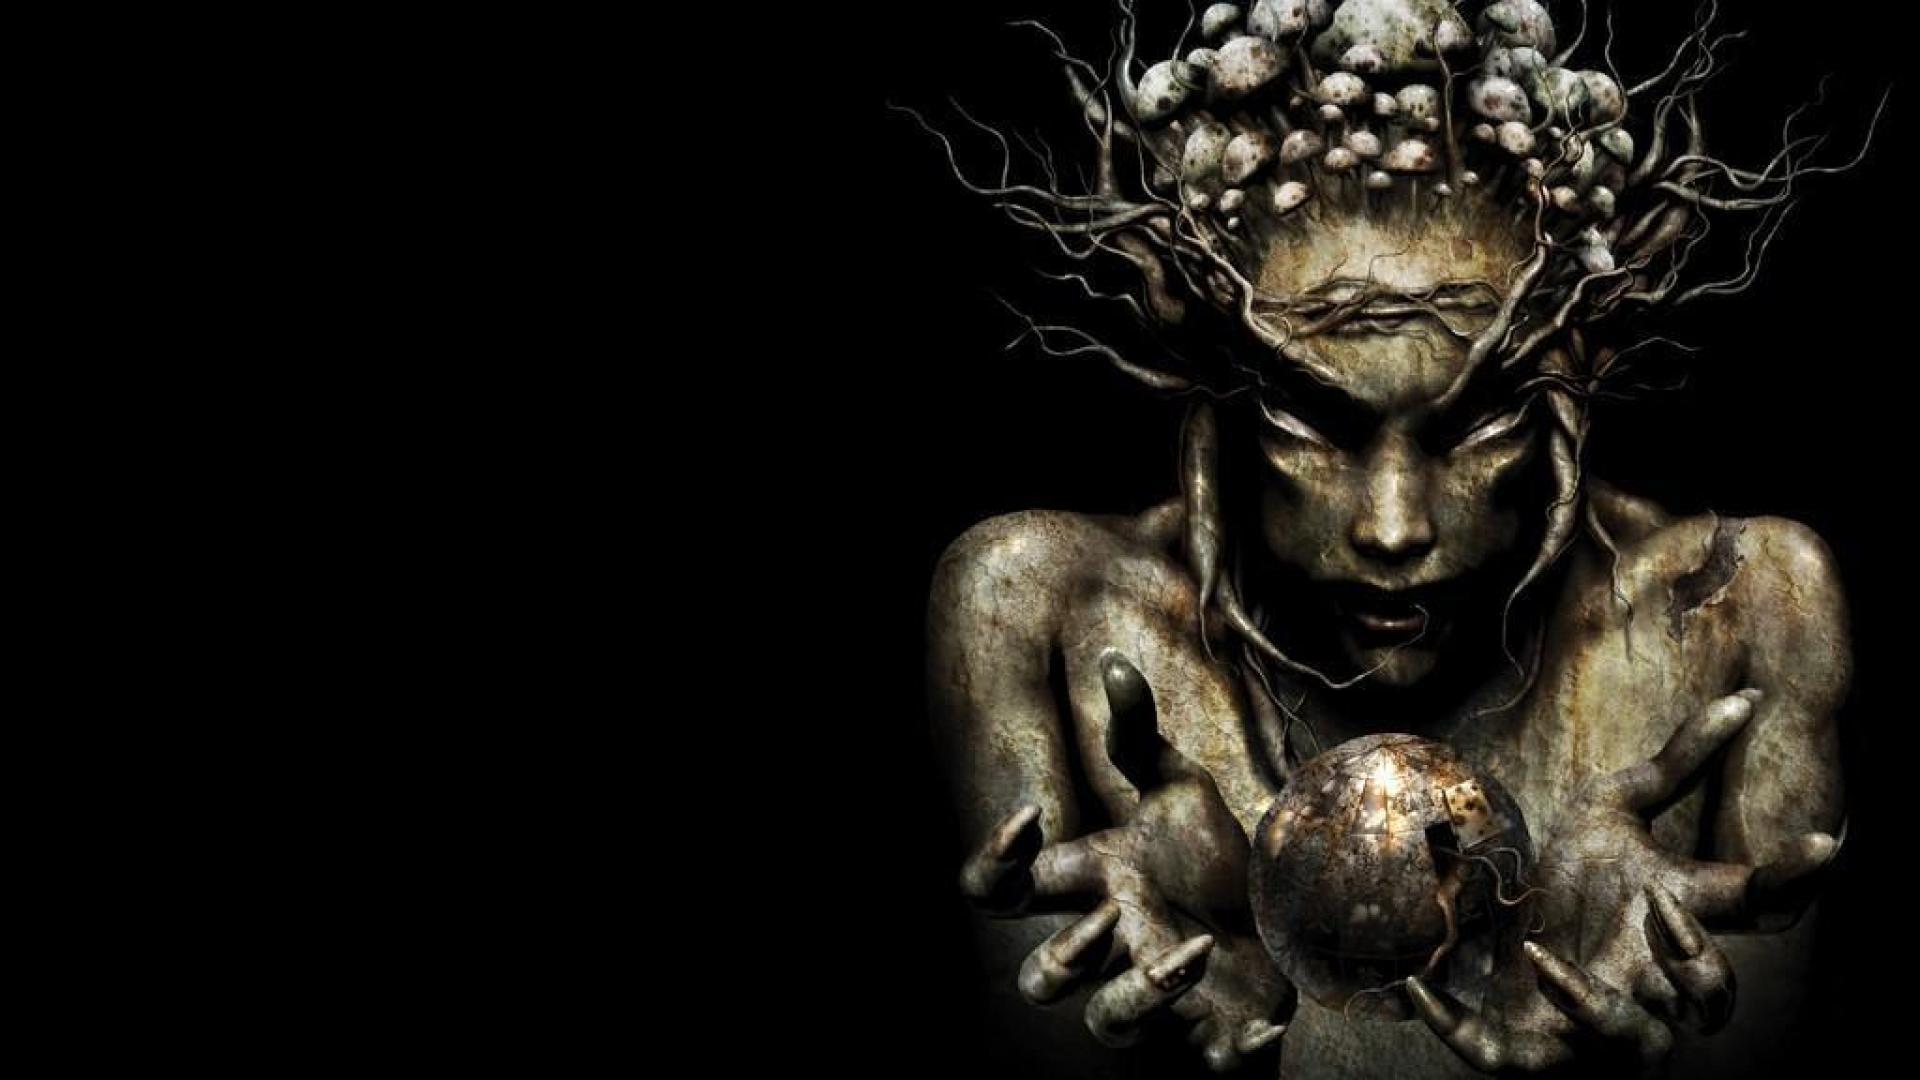 Dark Psychedelic Wallpaper Hd